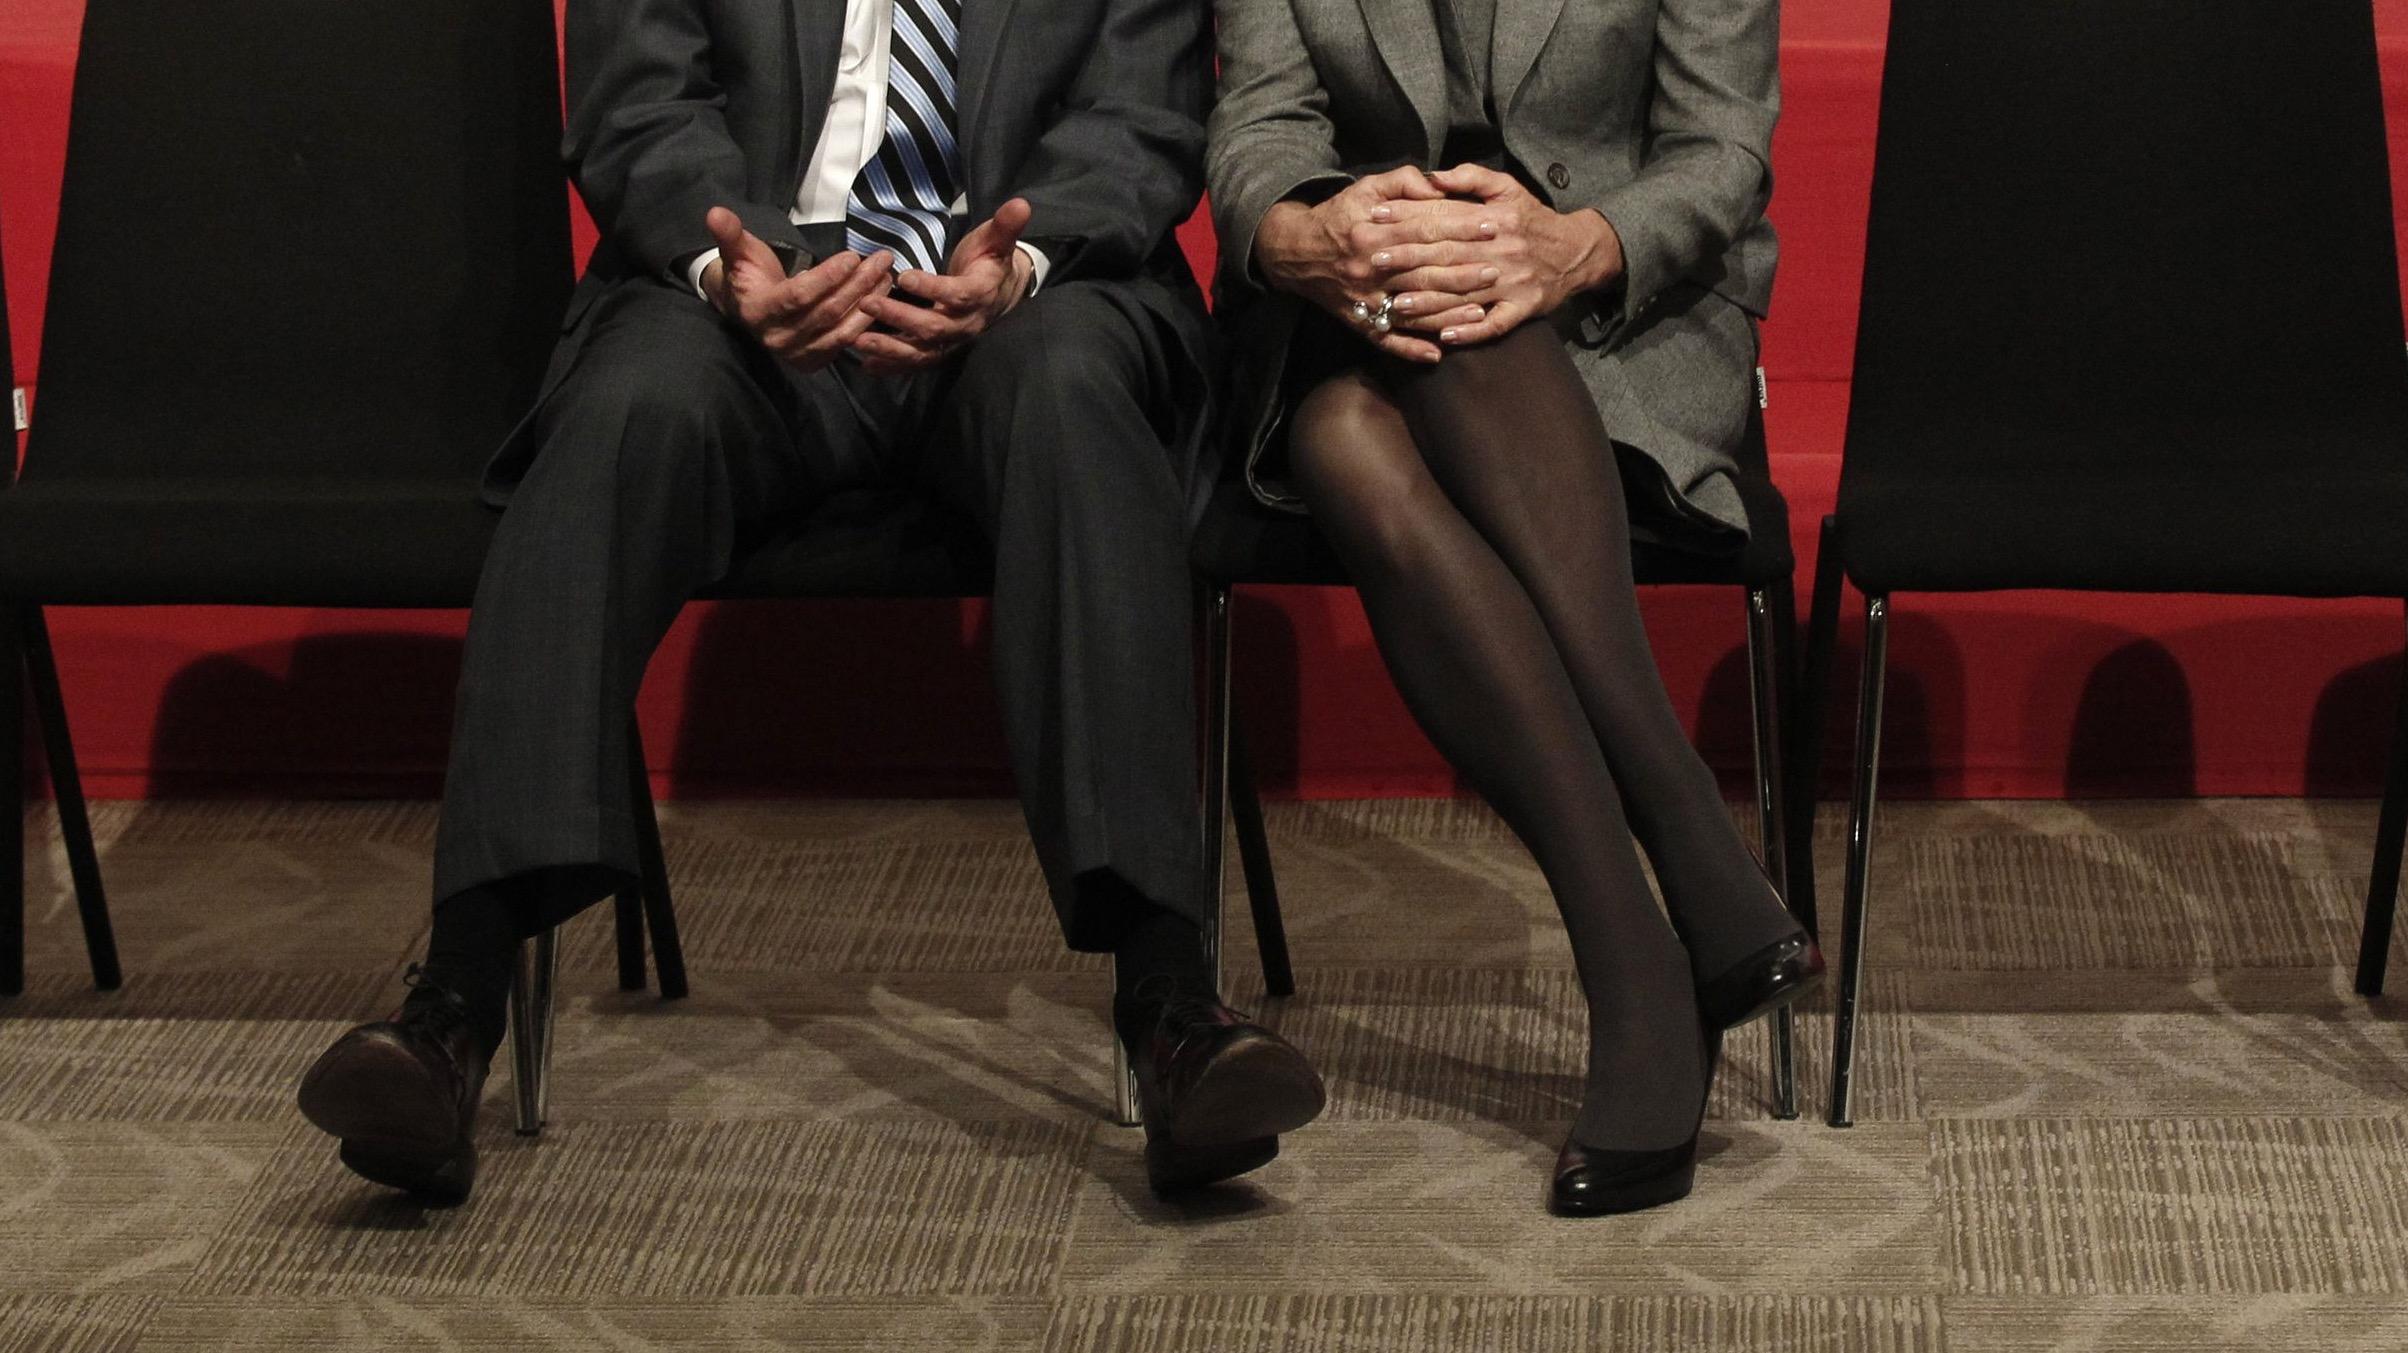 U.S. Treasury Secretary Jack Lew (L) talks with International Monetary Fund (IMF) Managing Director Christine Lagarde.